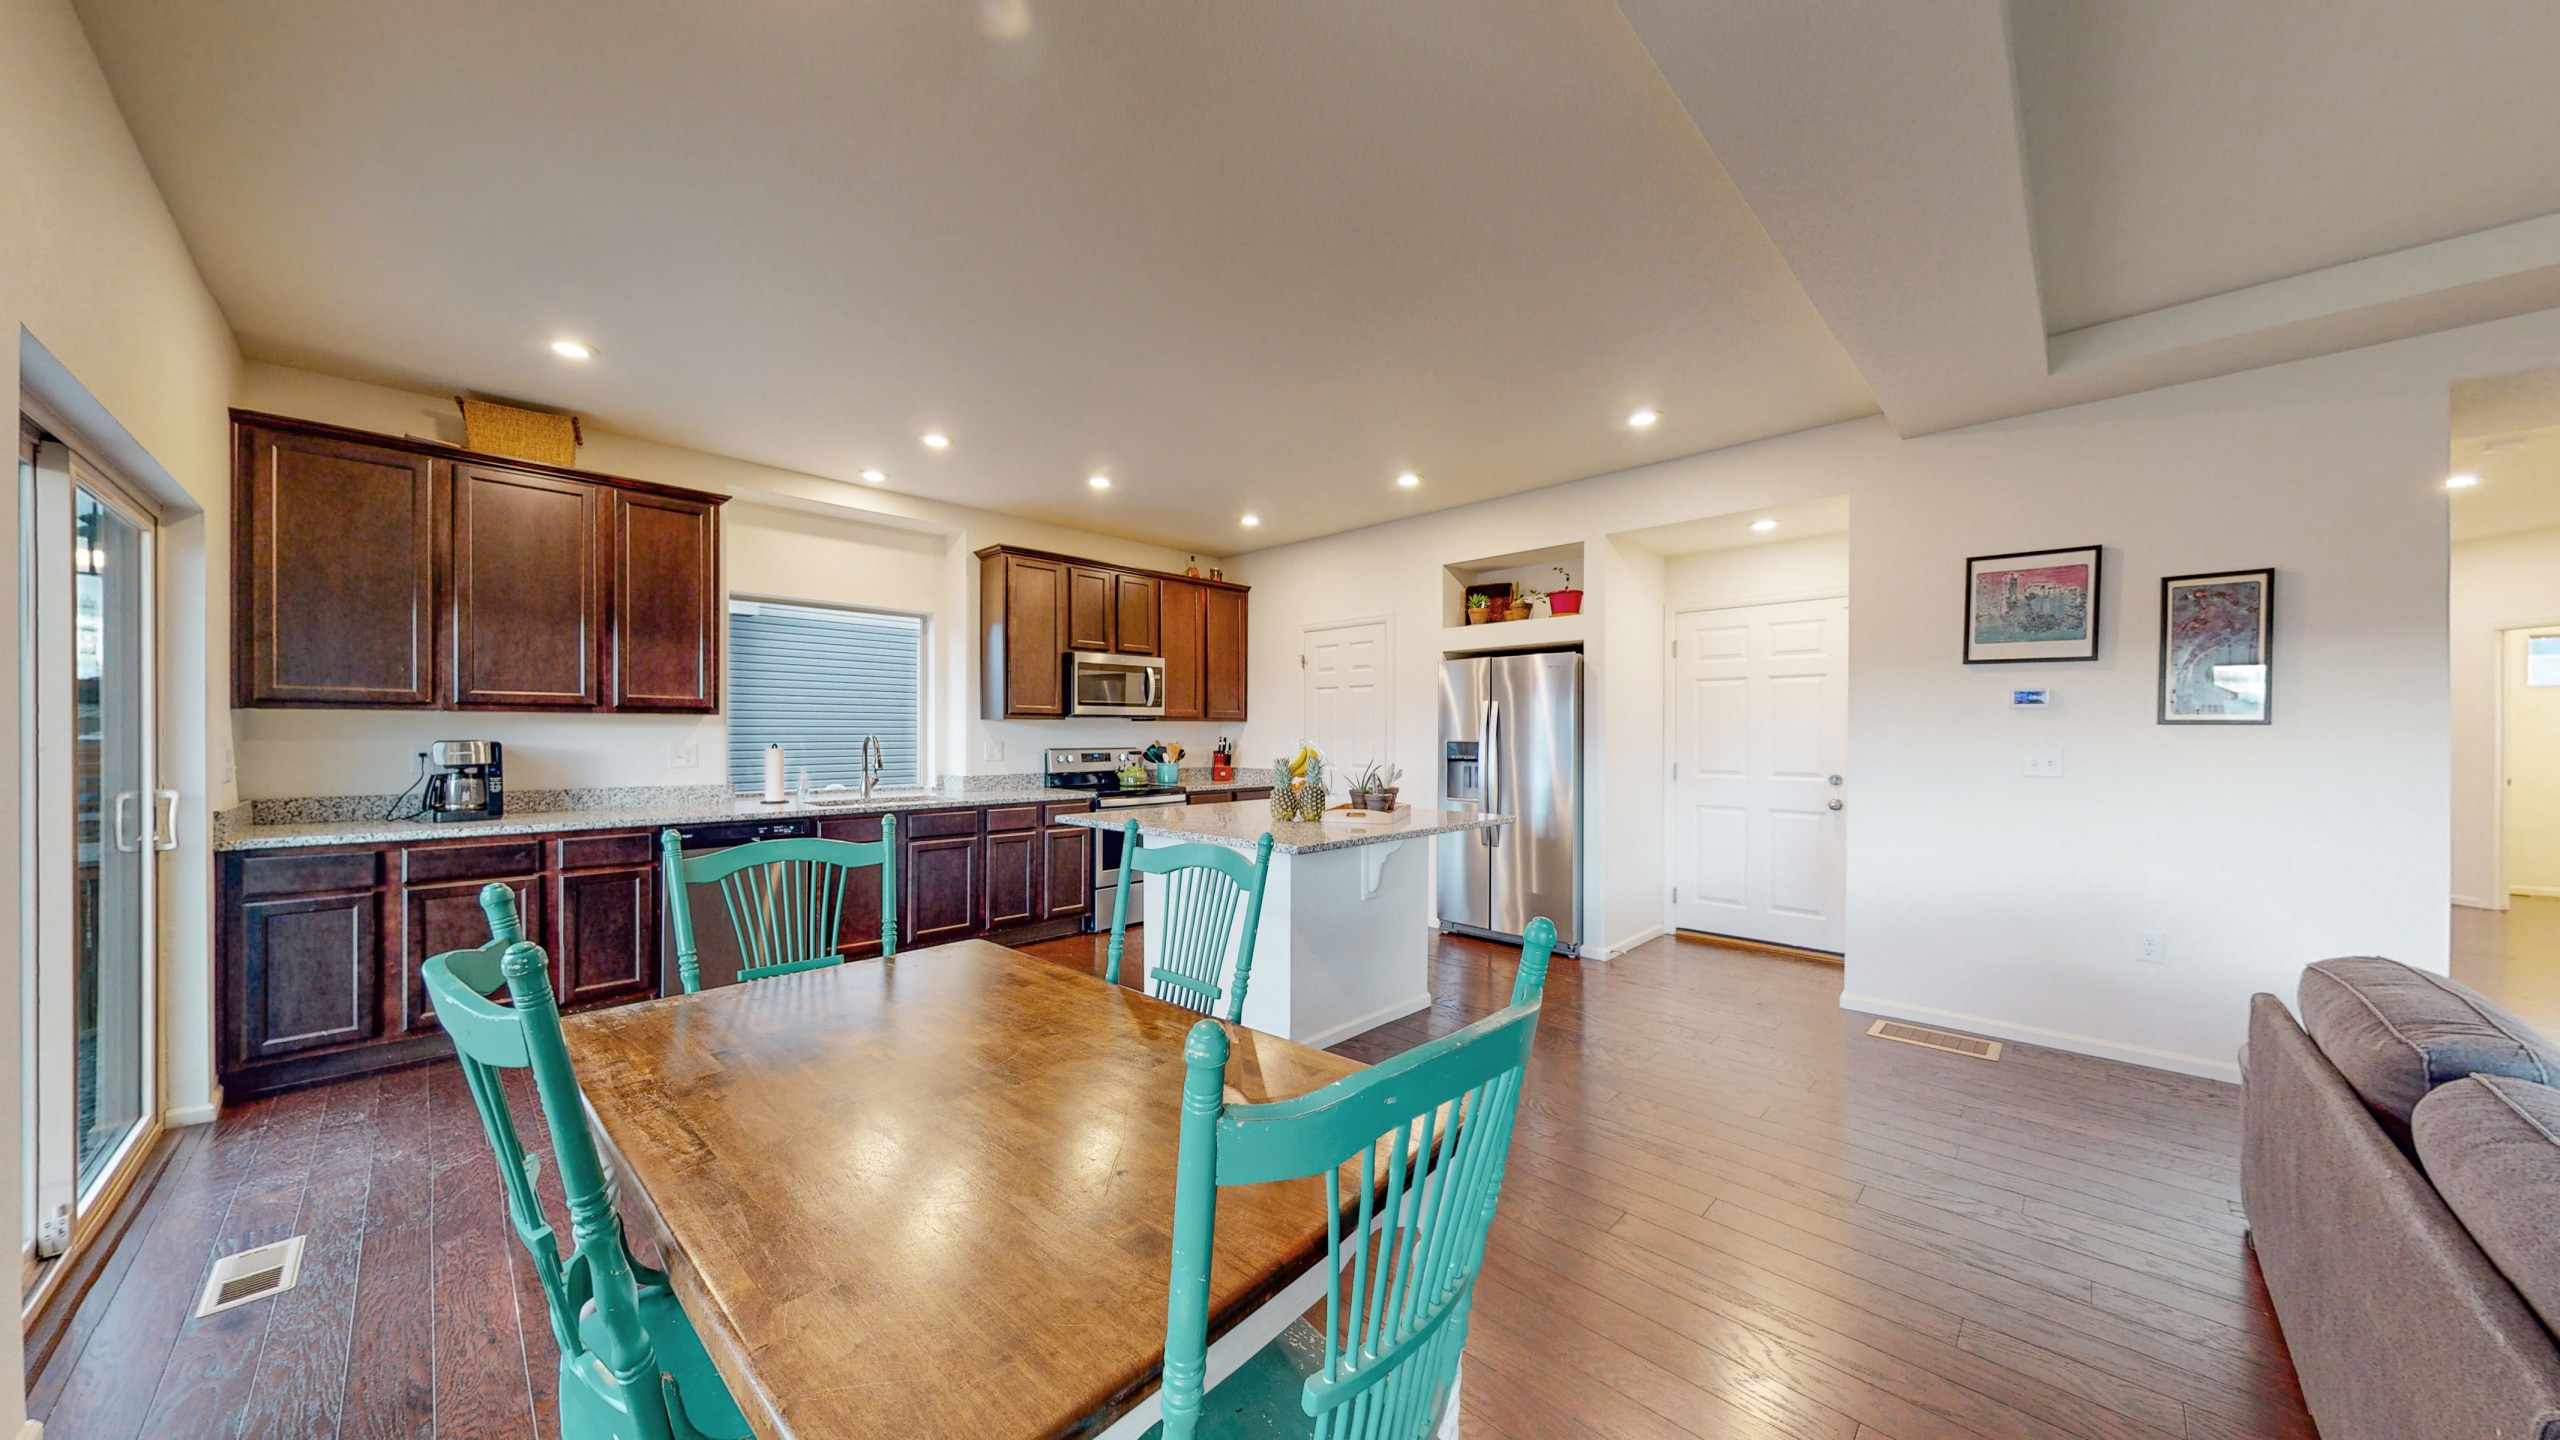 Kitchen with dark cabinets, white countertops, island